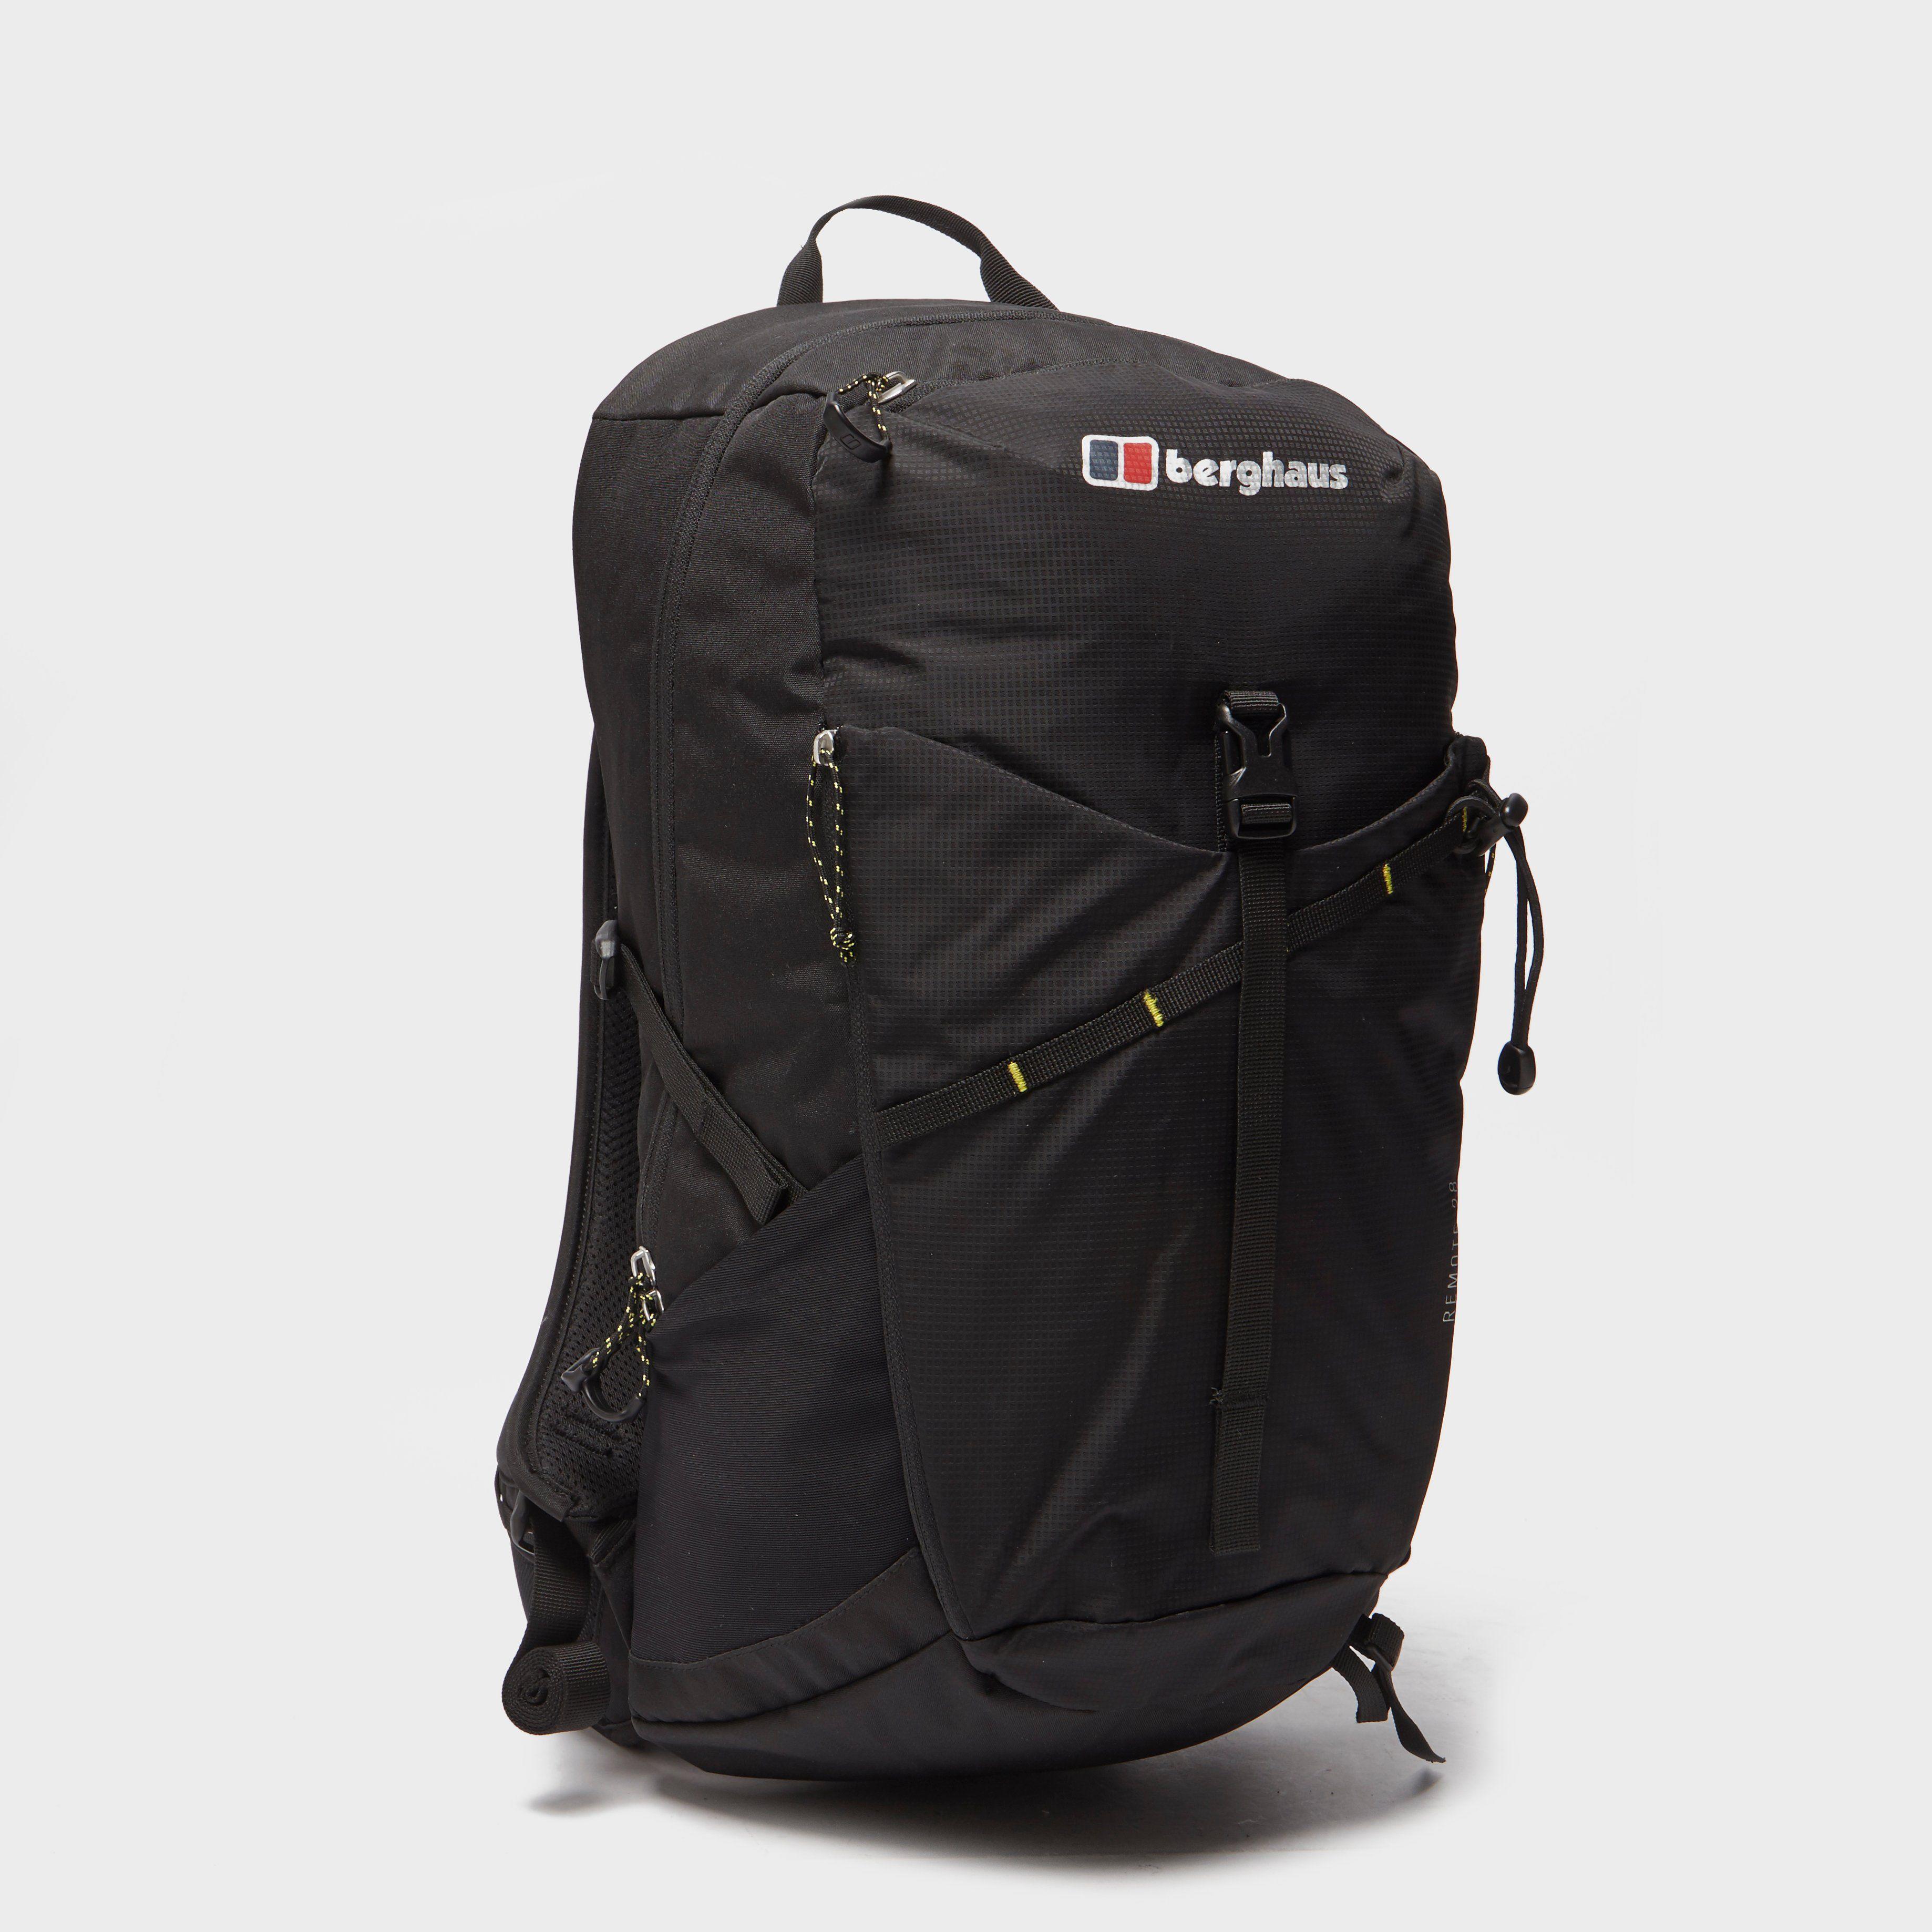 BERGHAUS Remote 28 Daypack